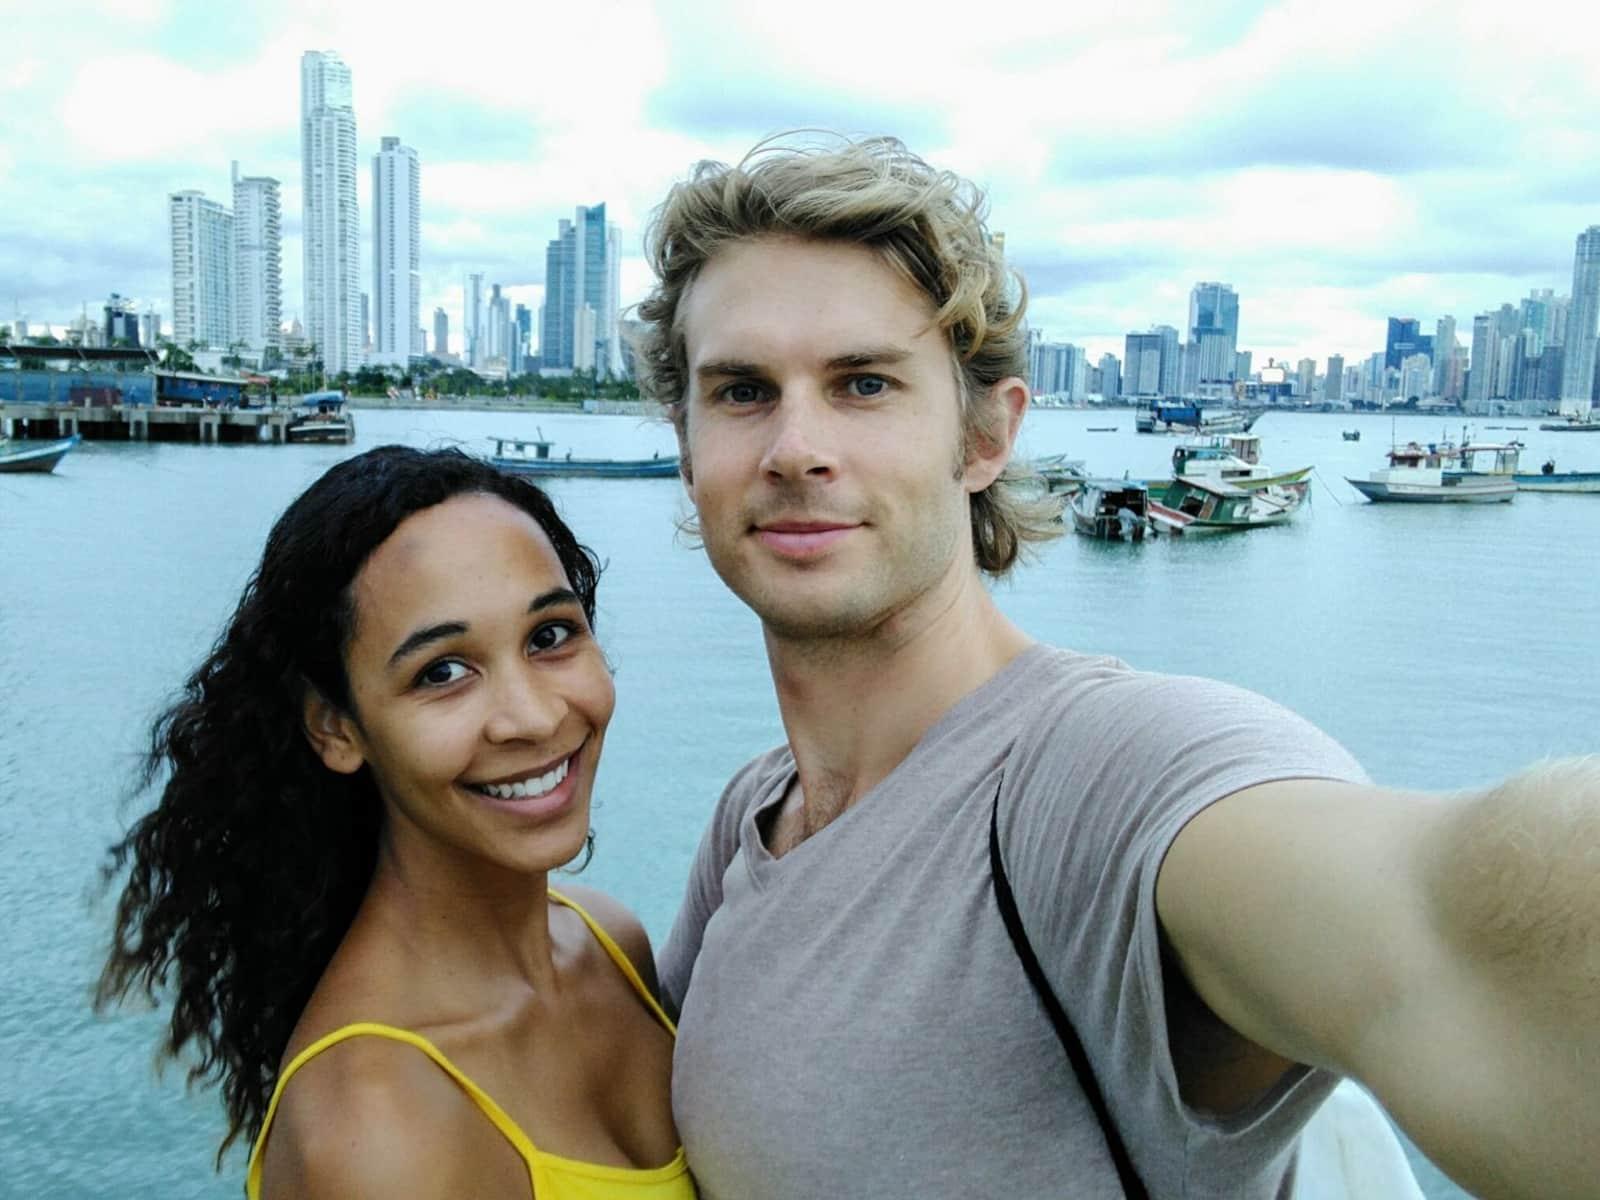 Nadine & Sam from Toronto, Ontario, Canada